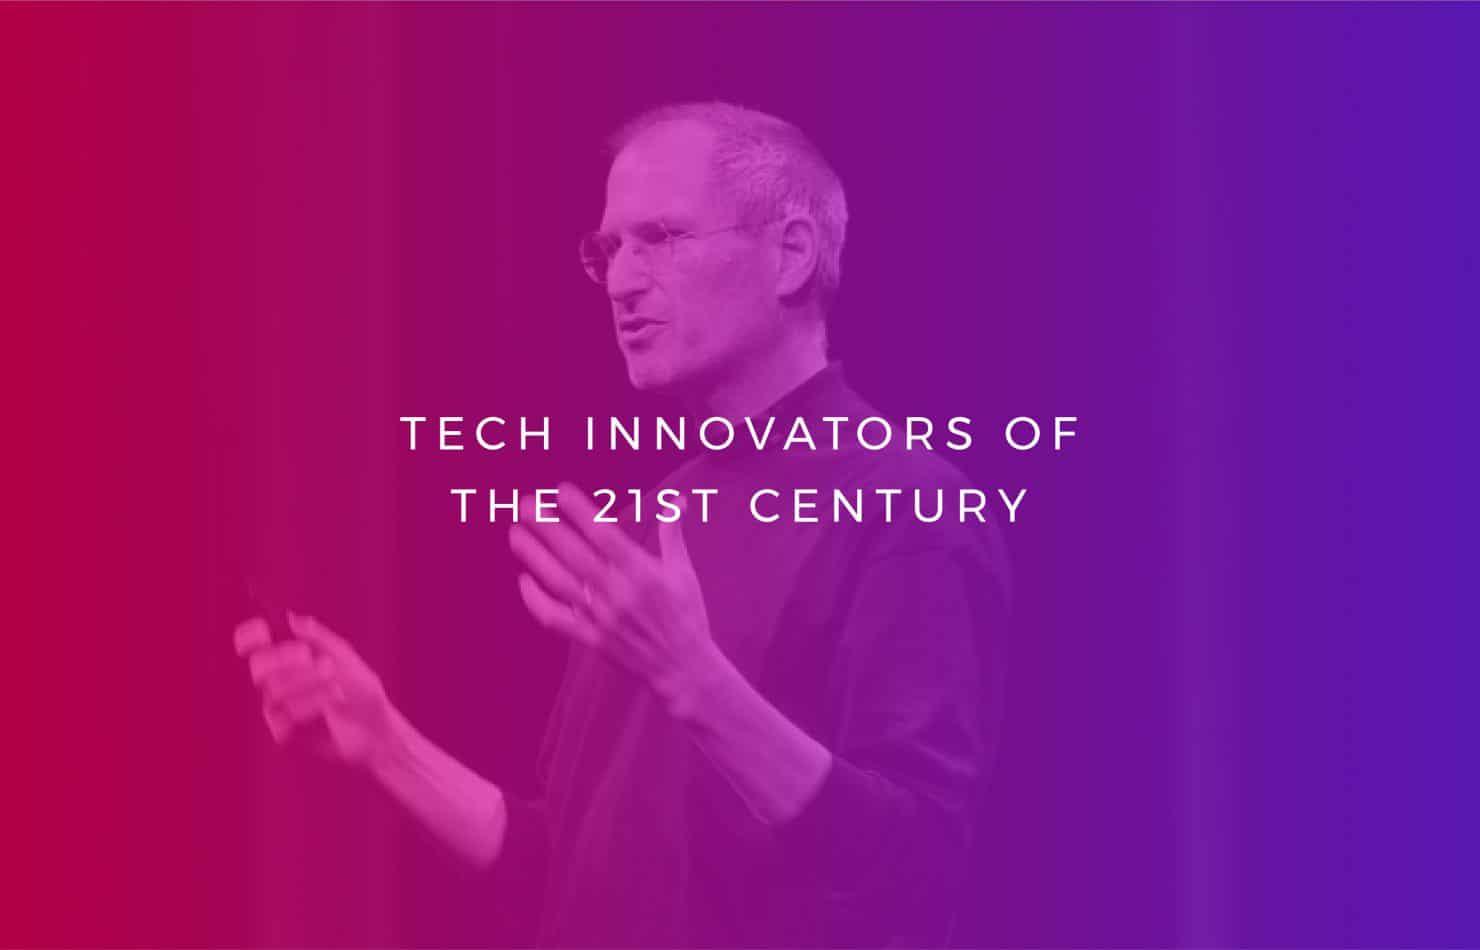 Tech Innovators of the 21st Century